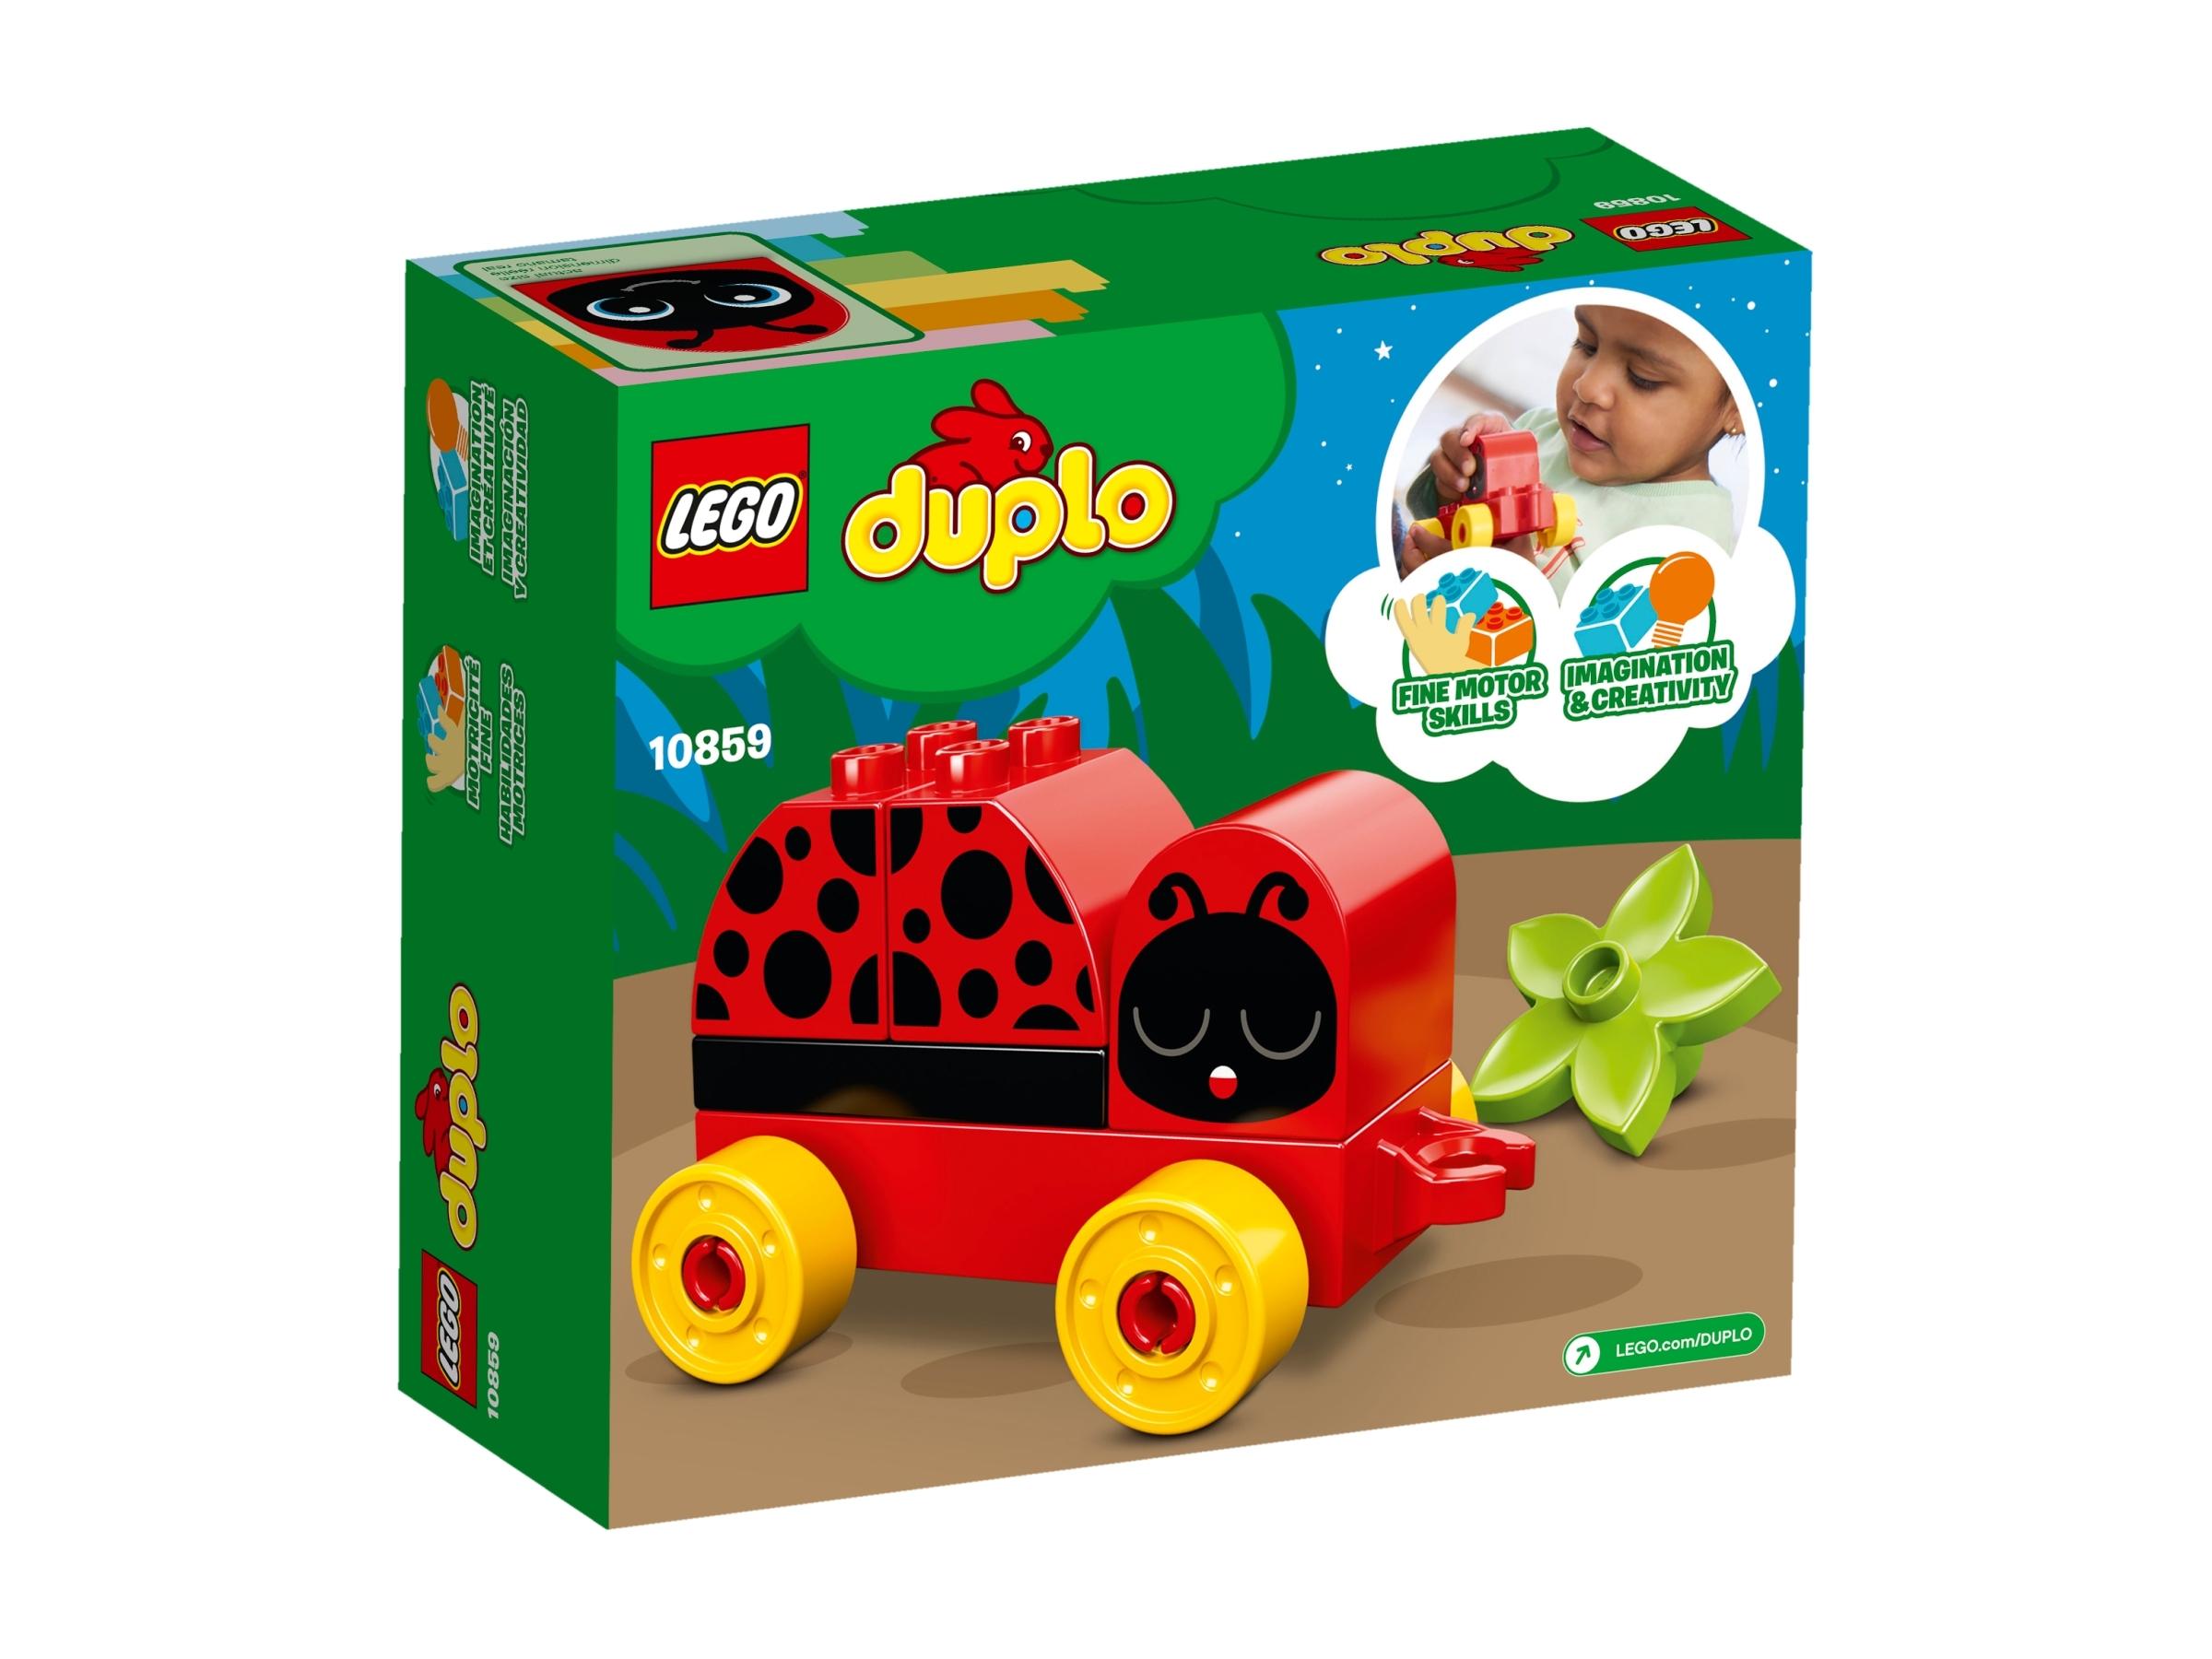 10859 LEGO Duplo Creative Play My First Ladybug 6 Pieces Age 1+